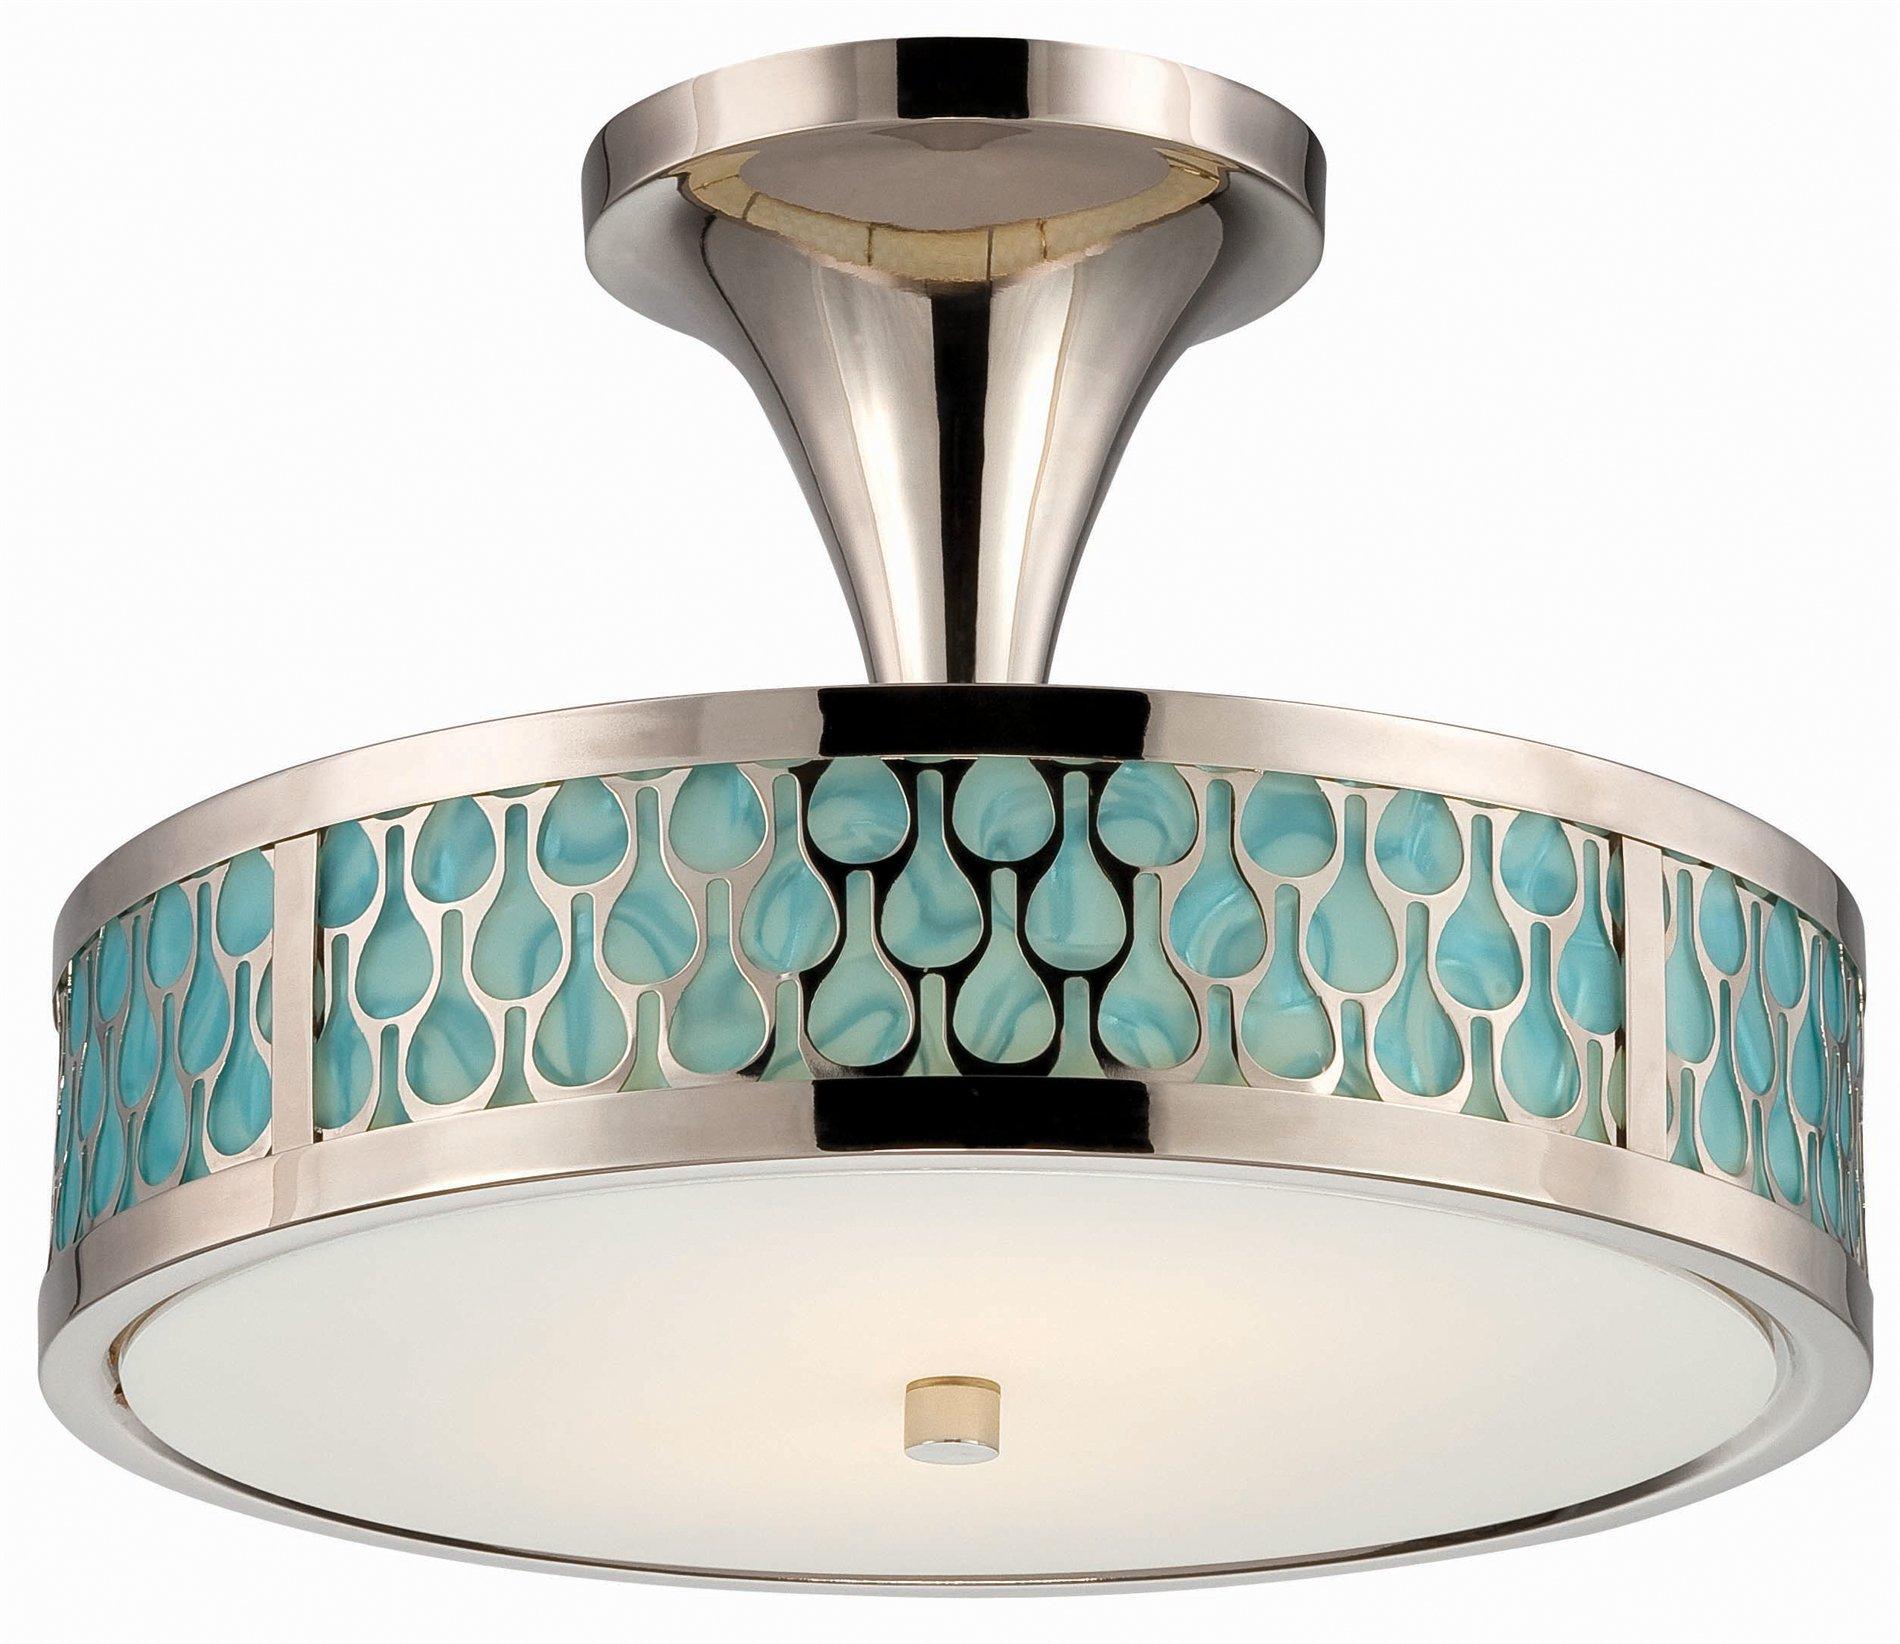 Nuvo Lighting 62 145 Raindrop Modern Contemporary LED Semi Flush Mount Ceil